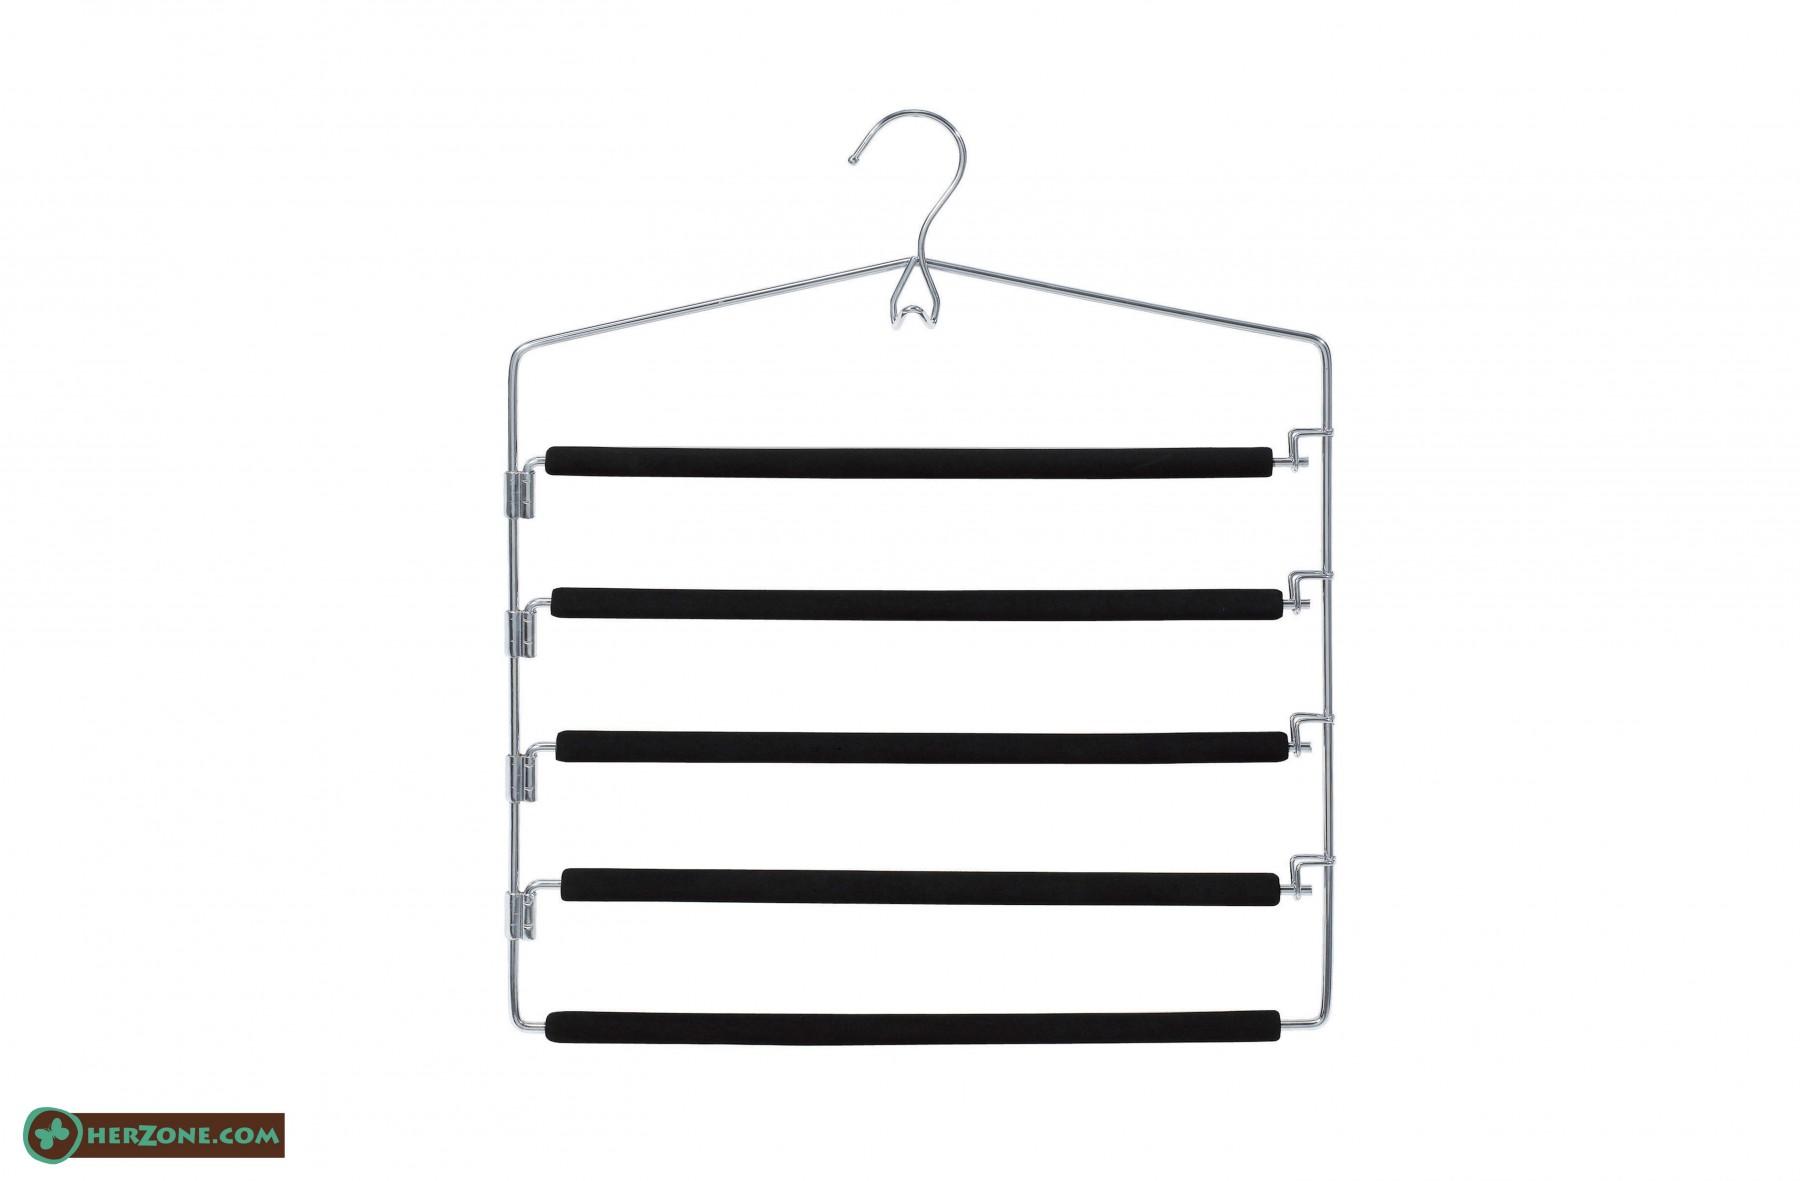 204.Rubber Pants hanger